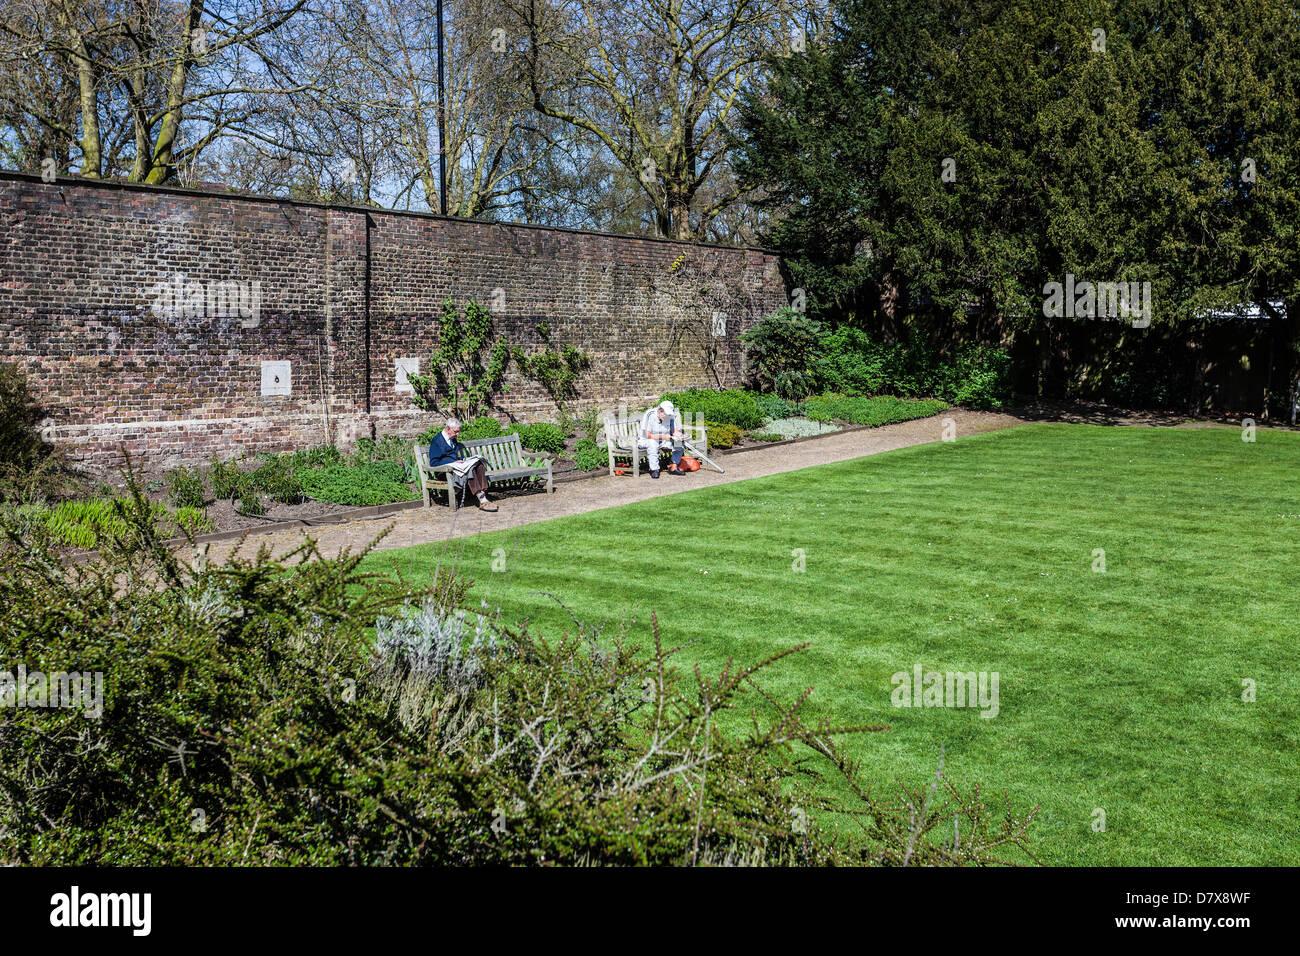 Senior visitors enjoying a sunny afternoon at Kitchen Garden, Kenwood, Hampstead Heath, London, England, UK - Stock Image